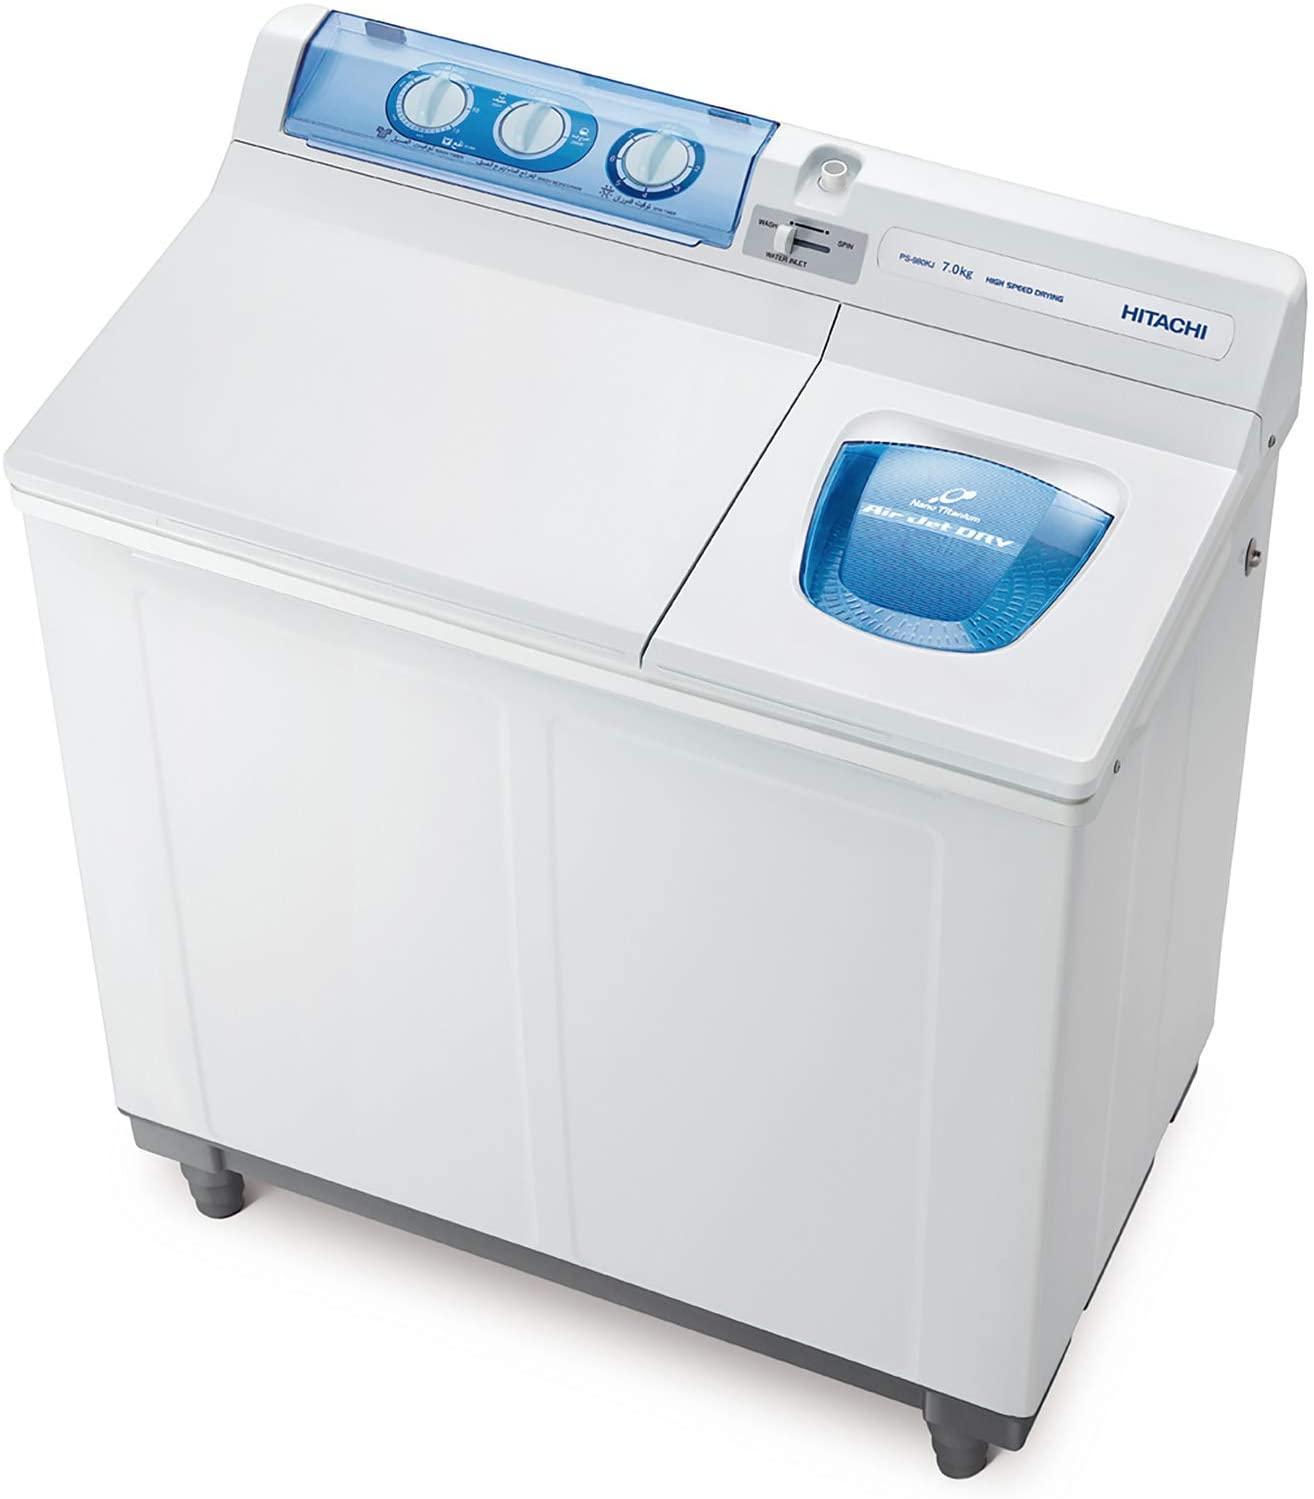 Hitachi 7 kg Semi Automatic Washing Machine Image